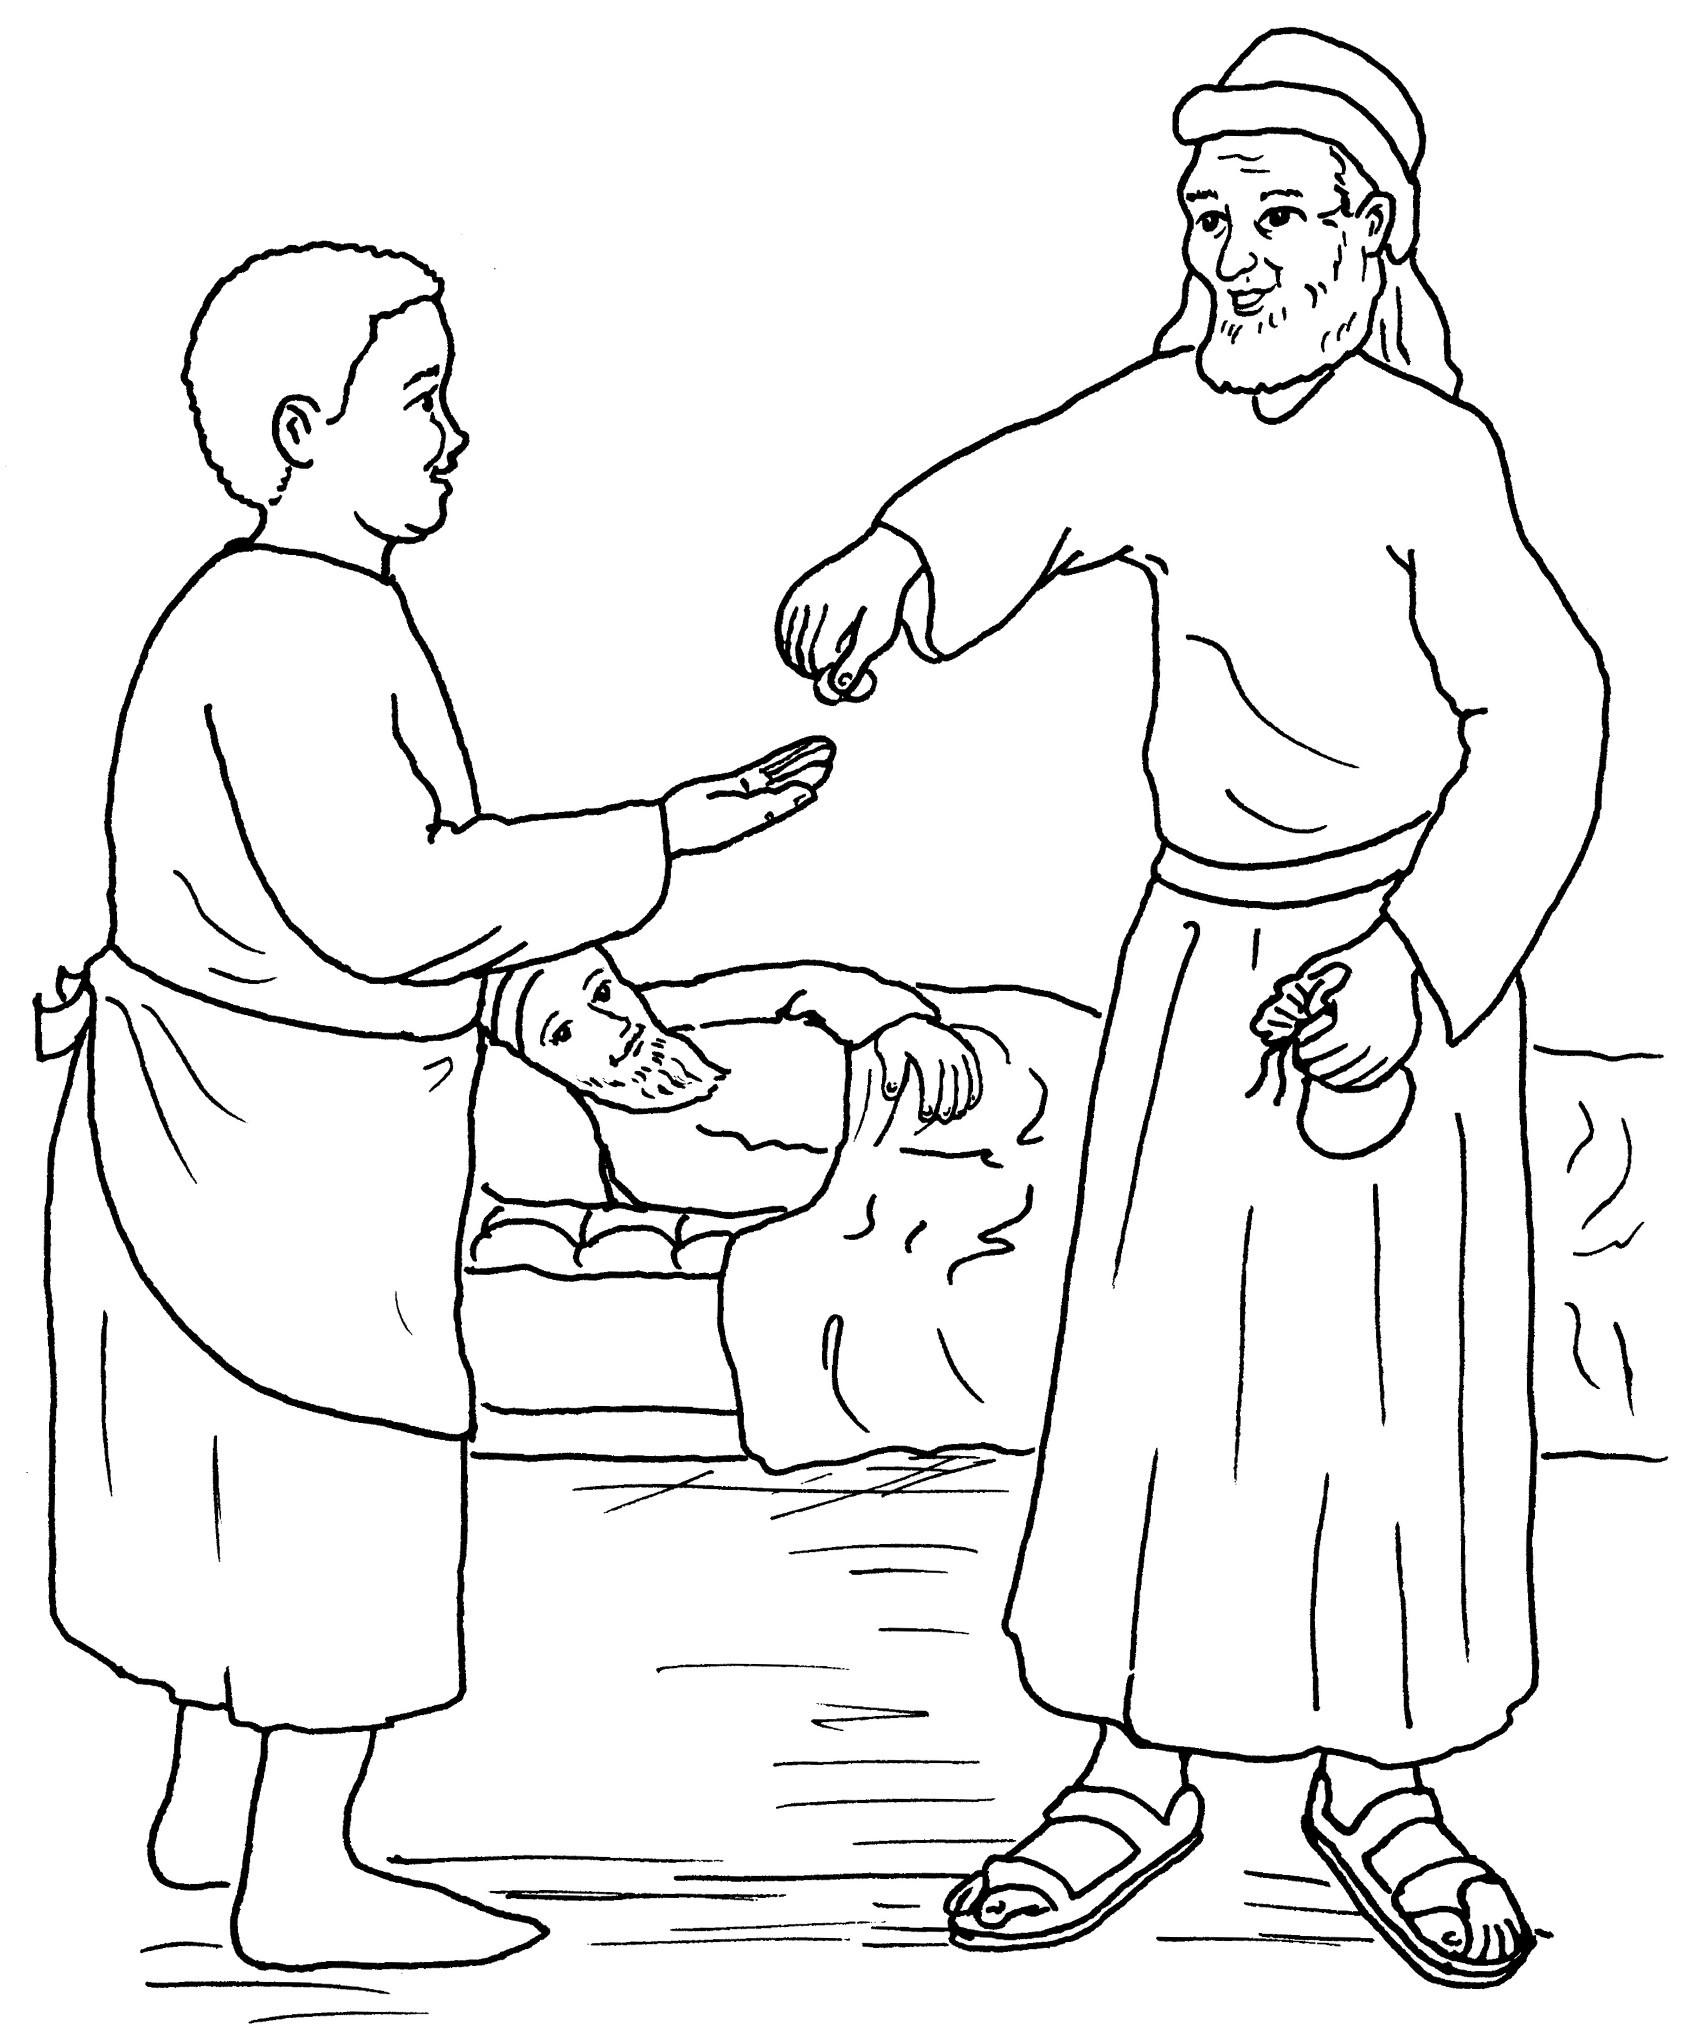 samaritan taken to an inn